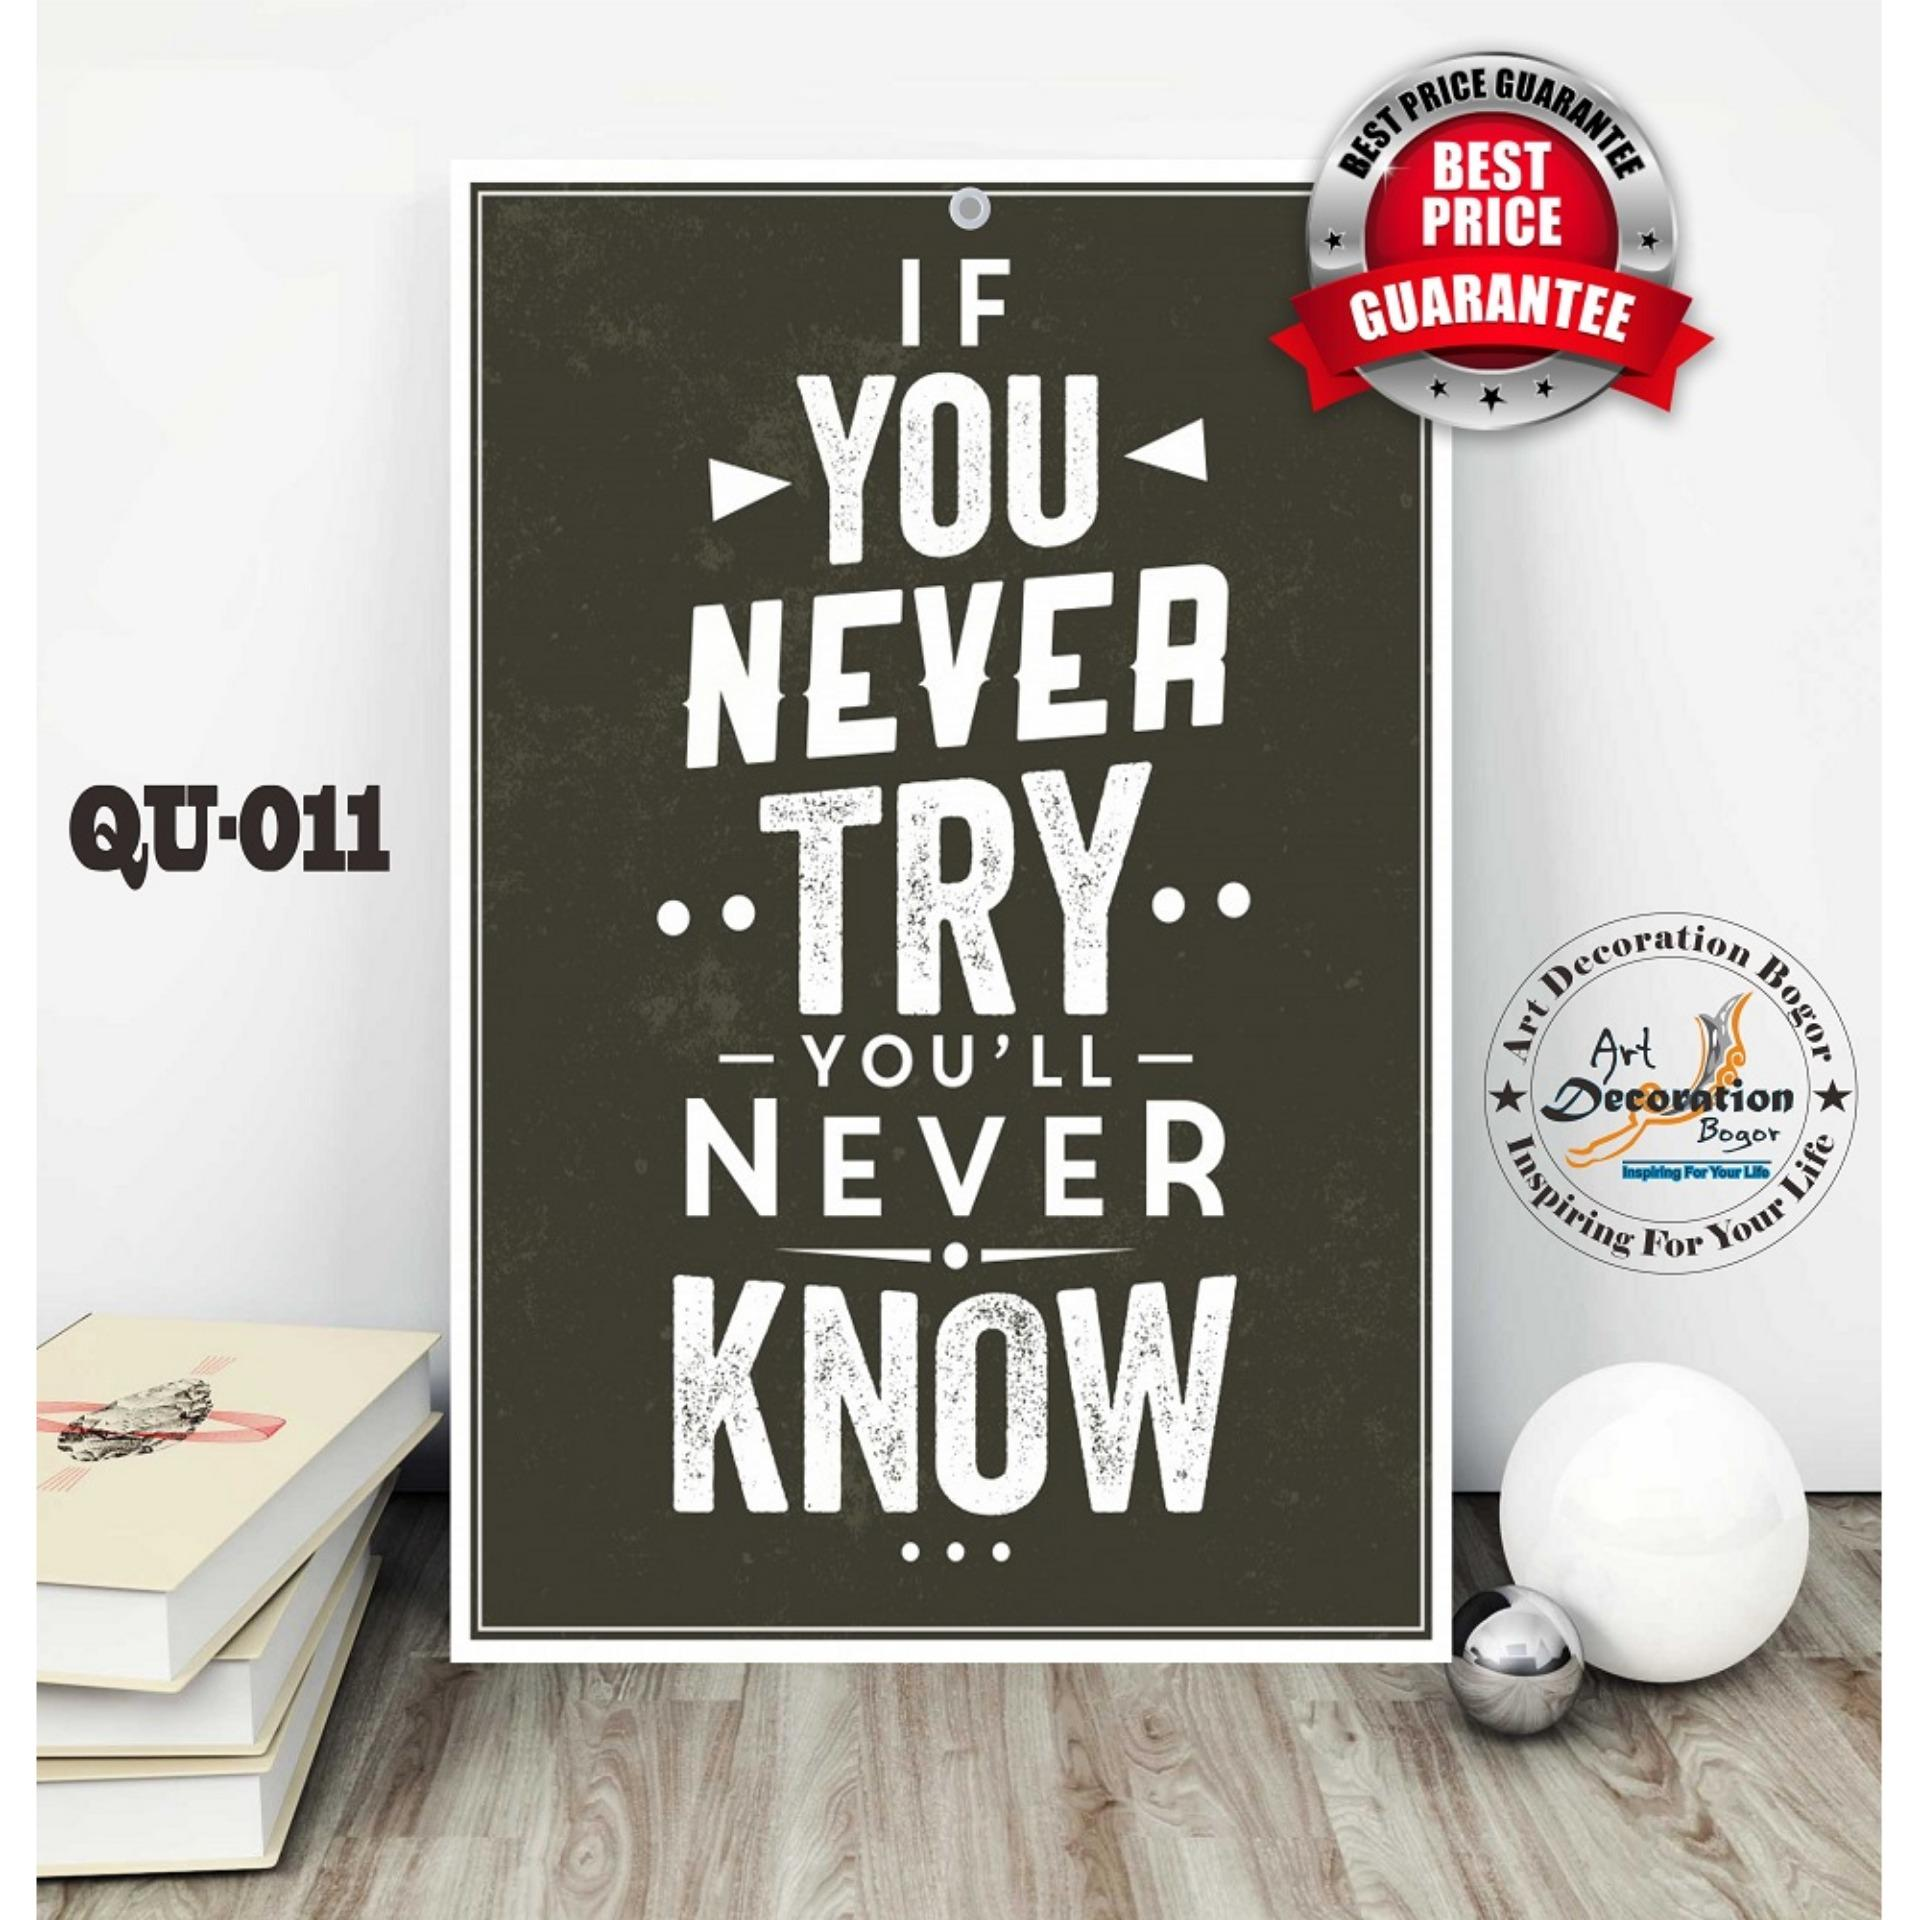 ... Wall Decor Poster Super Quotes VSQ-40 Terbaru. Source · Hiasan Dinding kayu Kode VSQ-52_/cafe vintage/coffee cafe / hiasan dinding